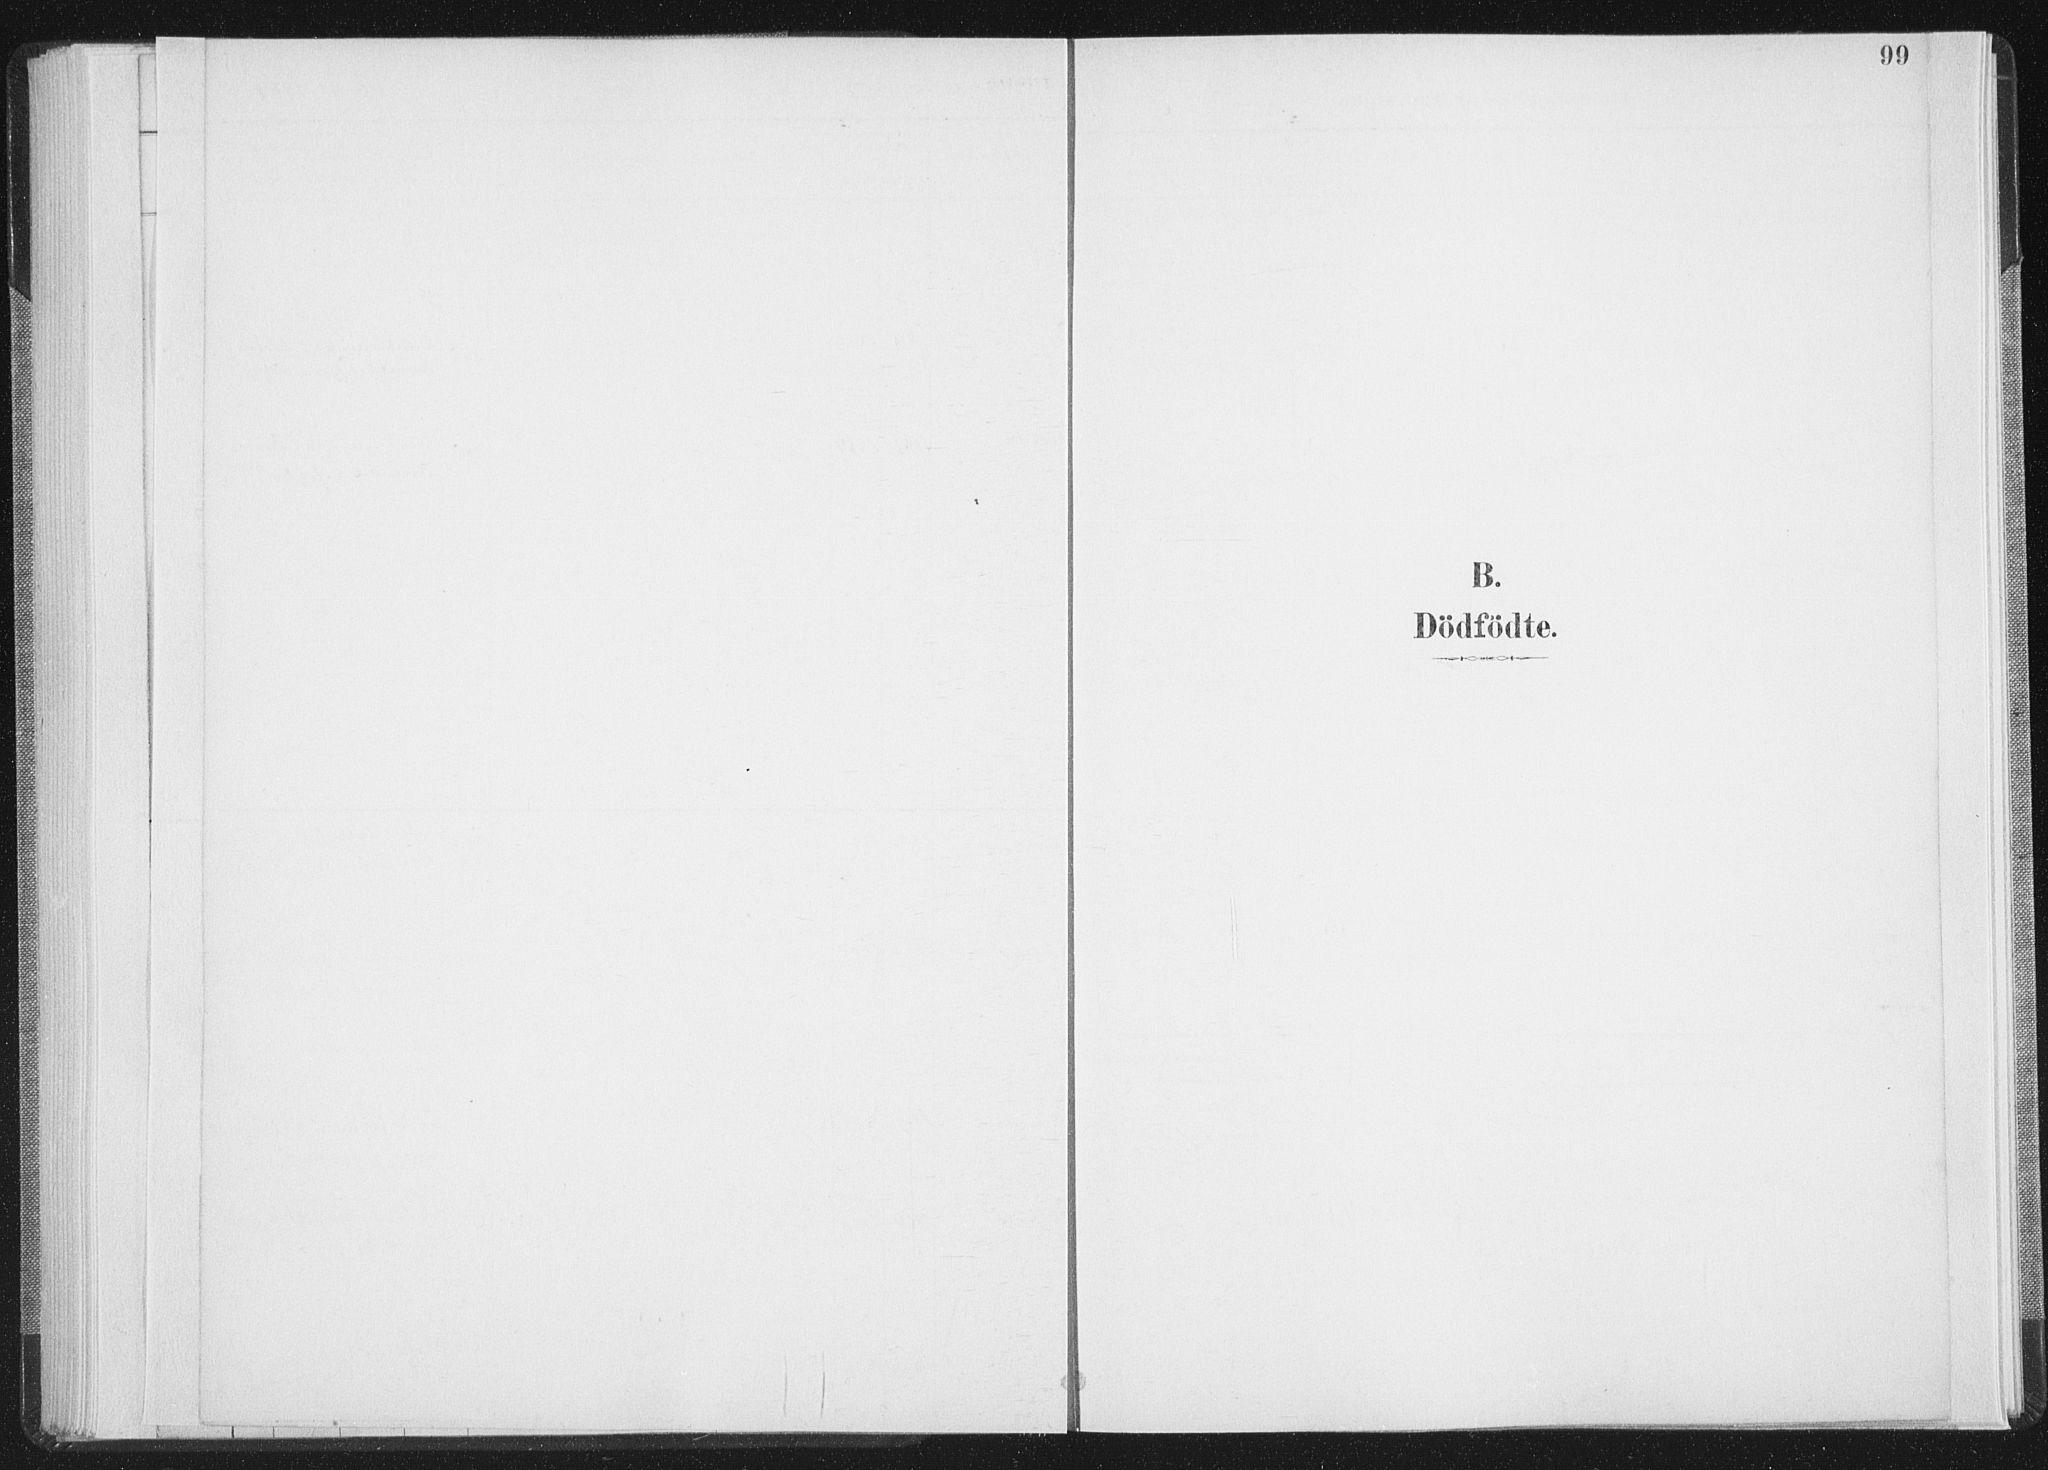 SAT, Ministerialprotokoller, klokkerbøker og fødselsregistre - Nordland, 898/L1422: Ministerialbok nr. 898A02, 1887-1908, s. 99